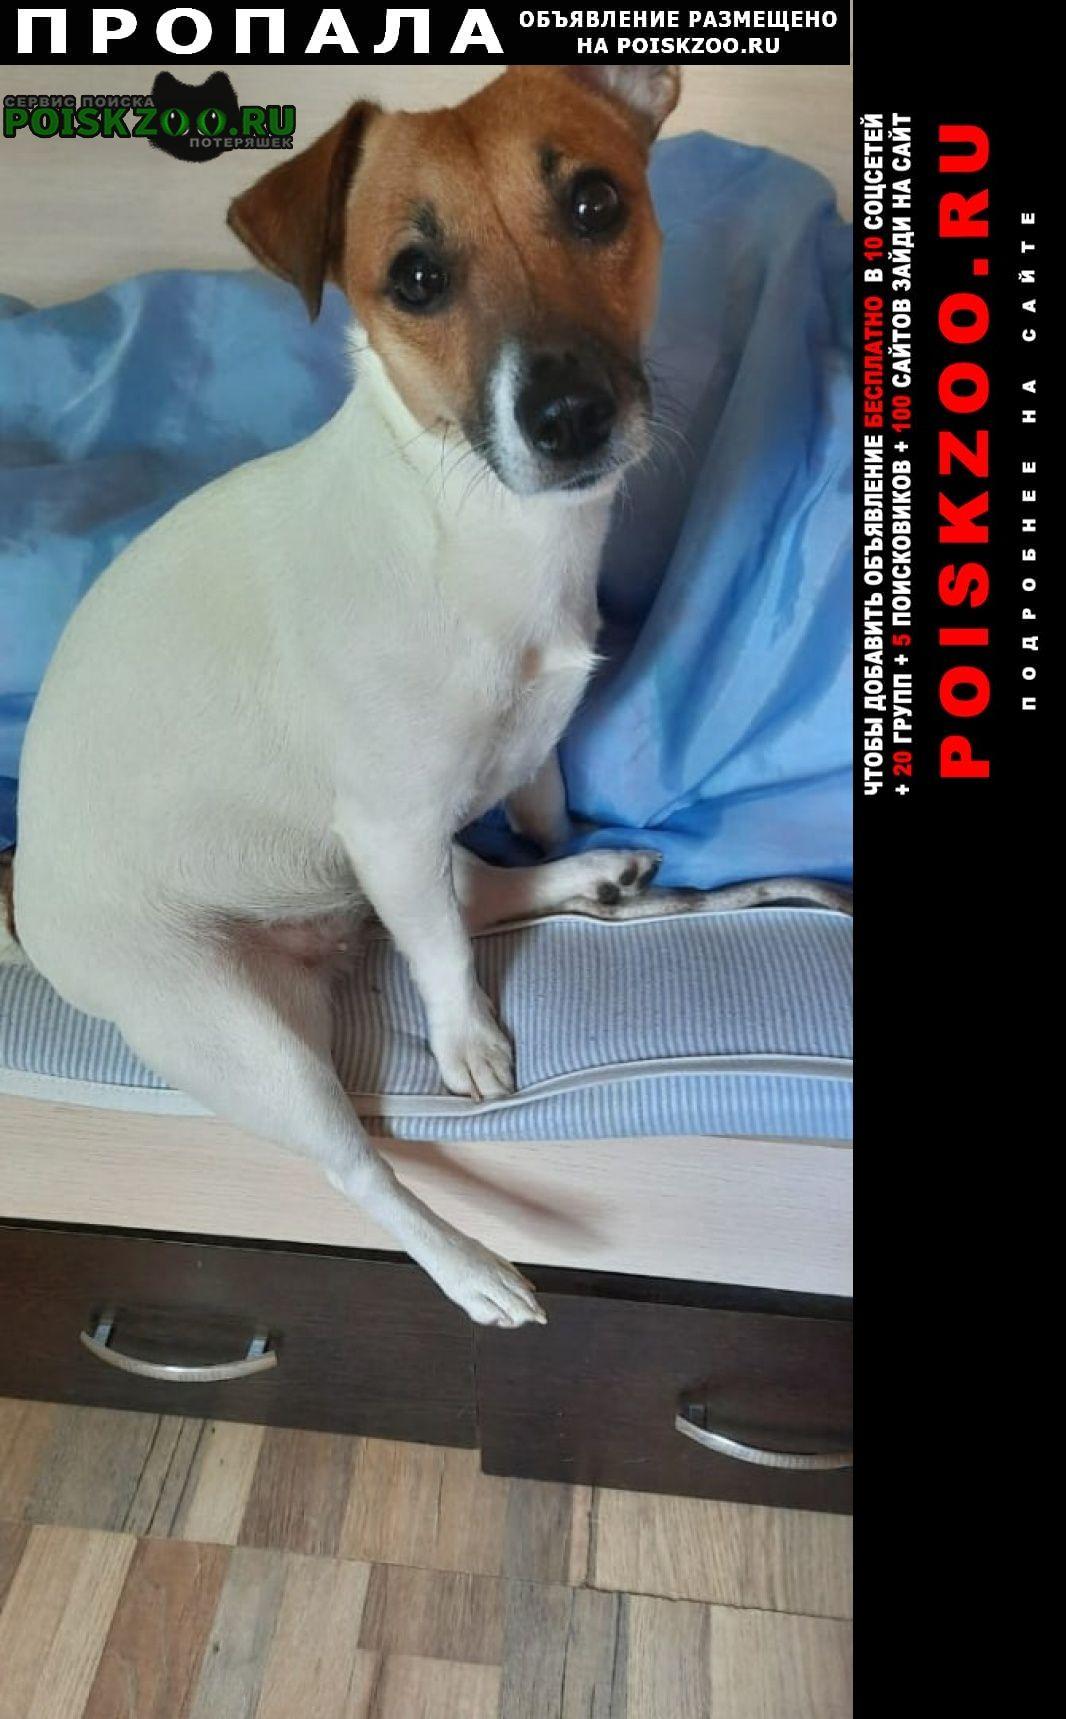 Пропала собака джек рассел девочка Москва